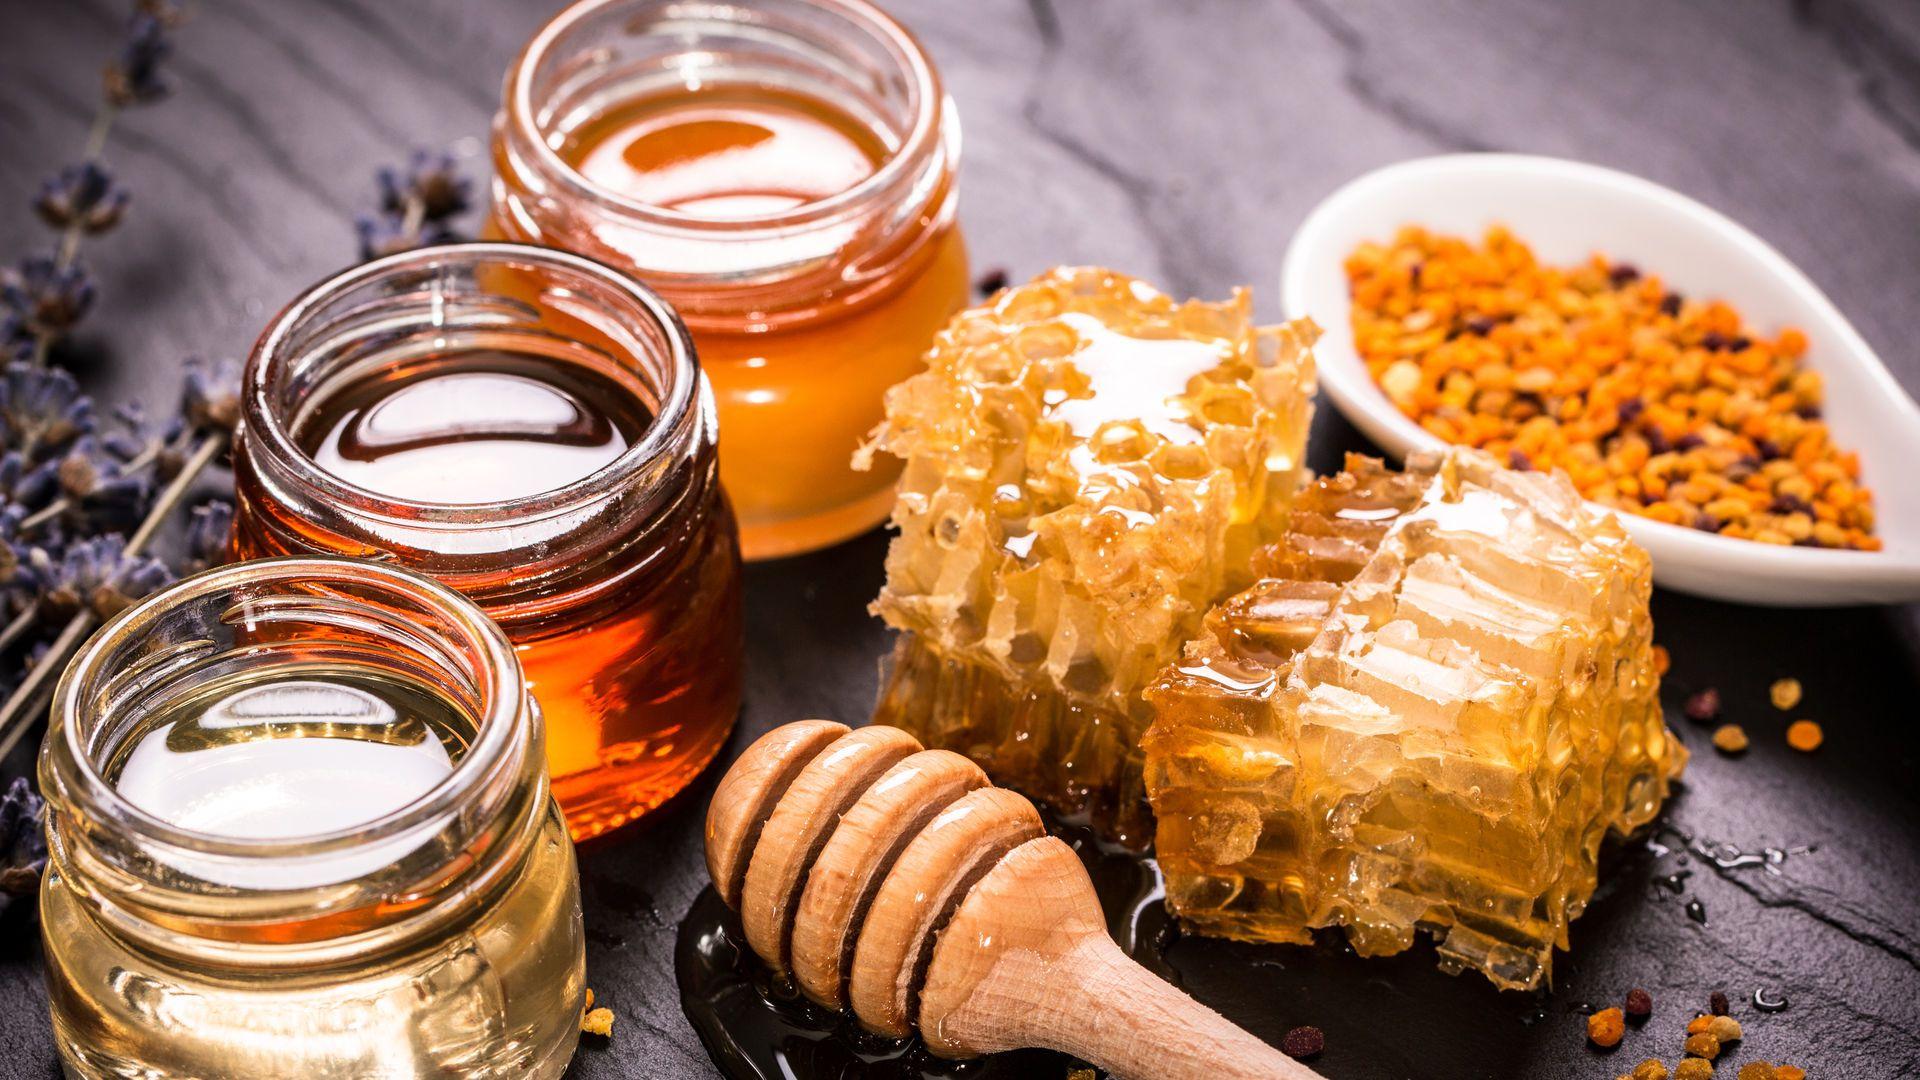 Honey wallpaper photo